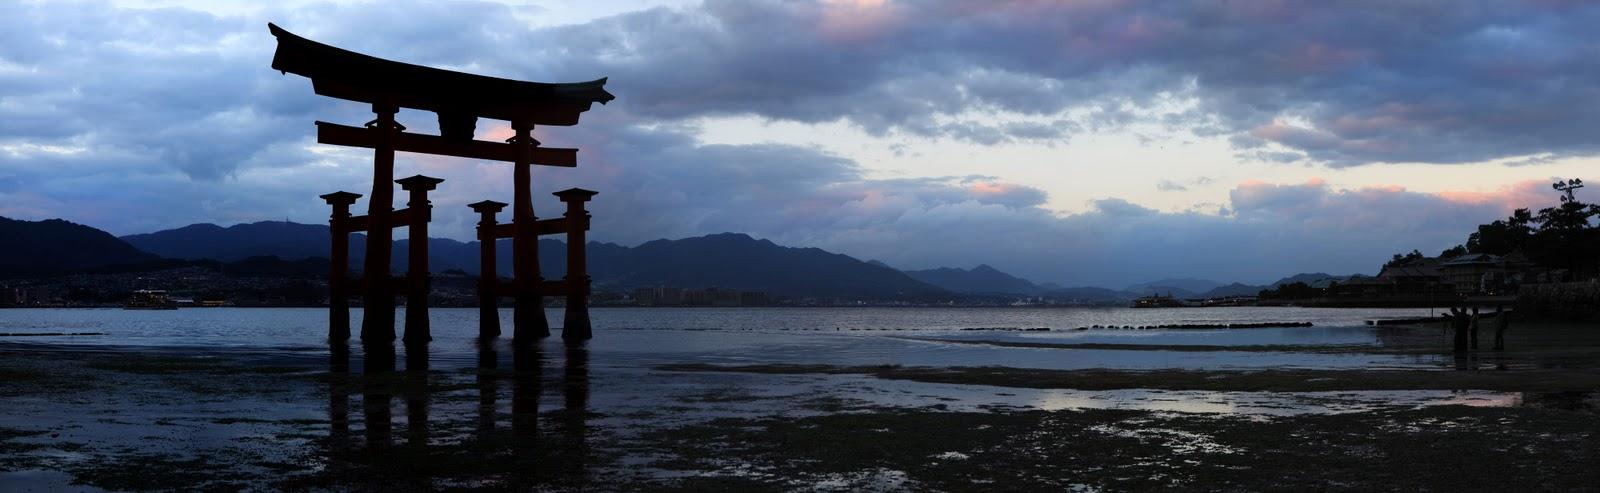 Japanese Wallpapers Itsukushima Torii Gate Special Domo Kun